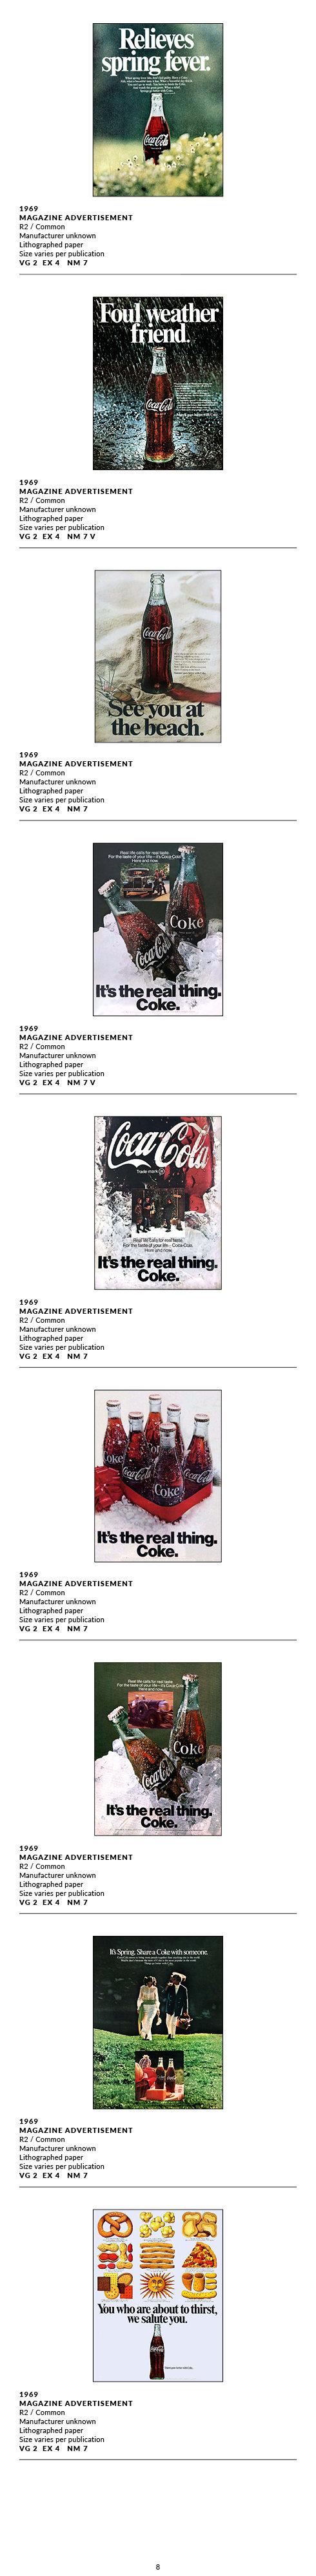 Desktop 1965-69 Ads Master8.jpg